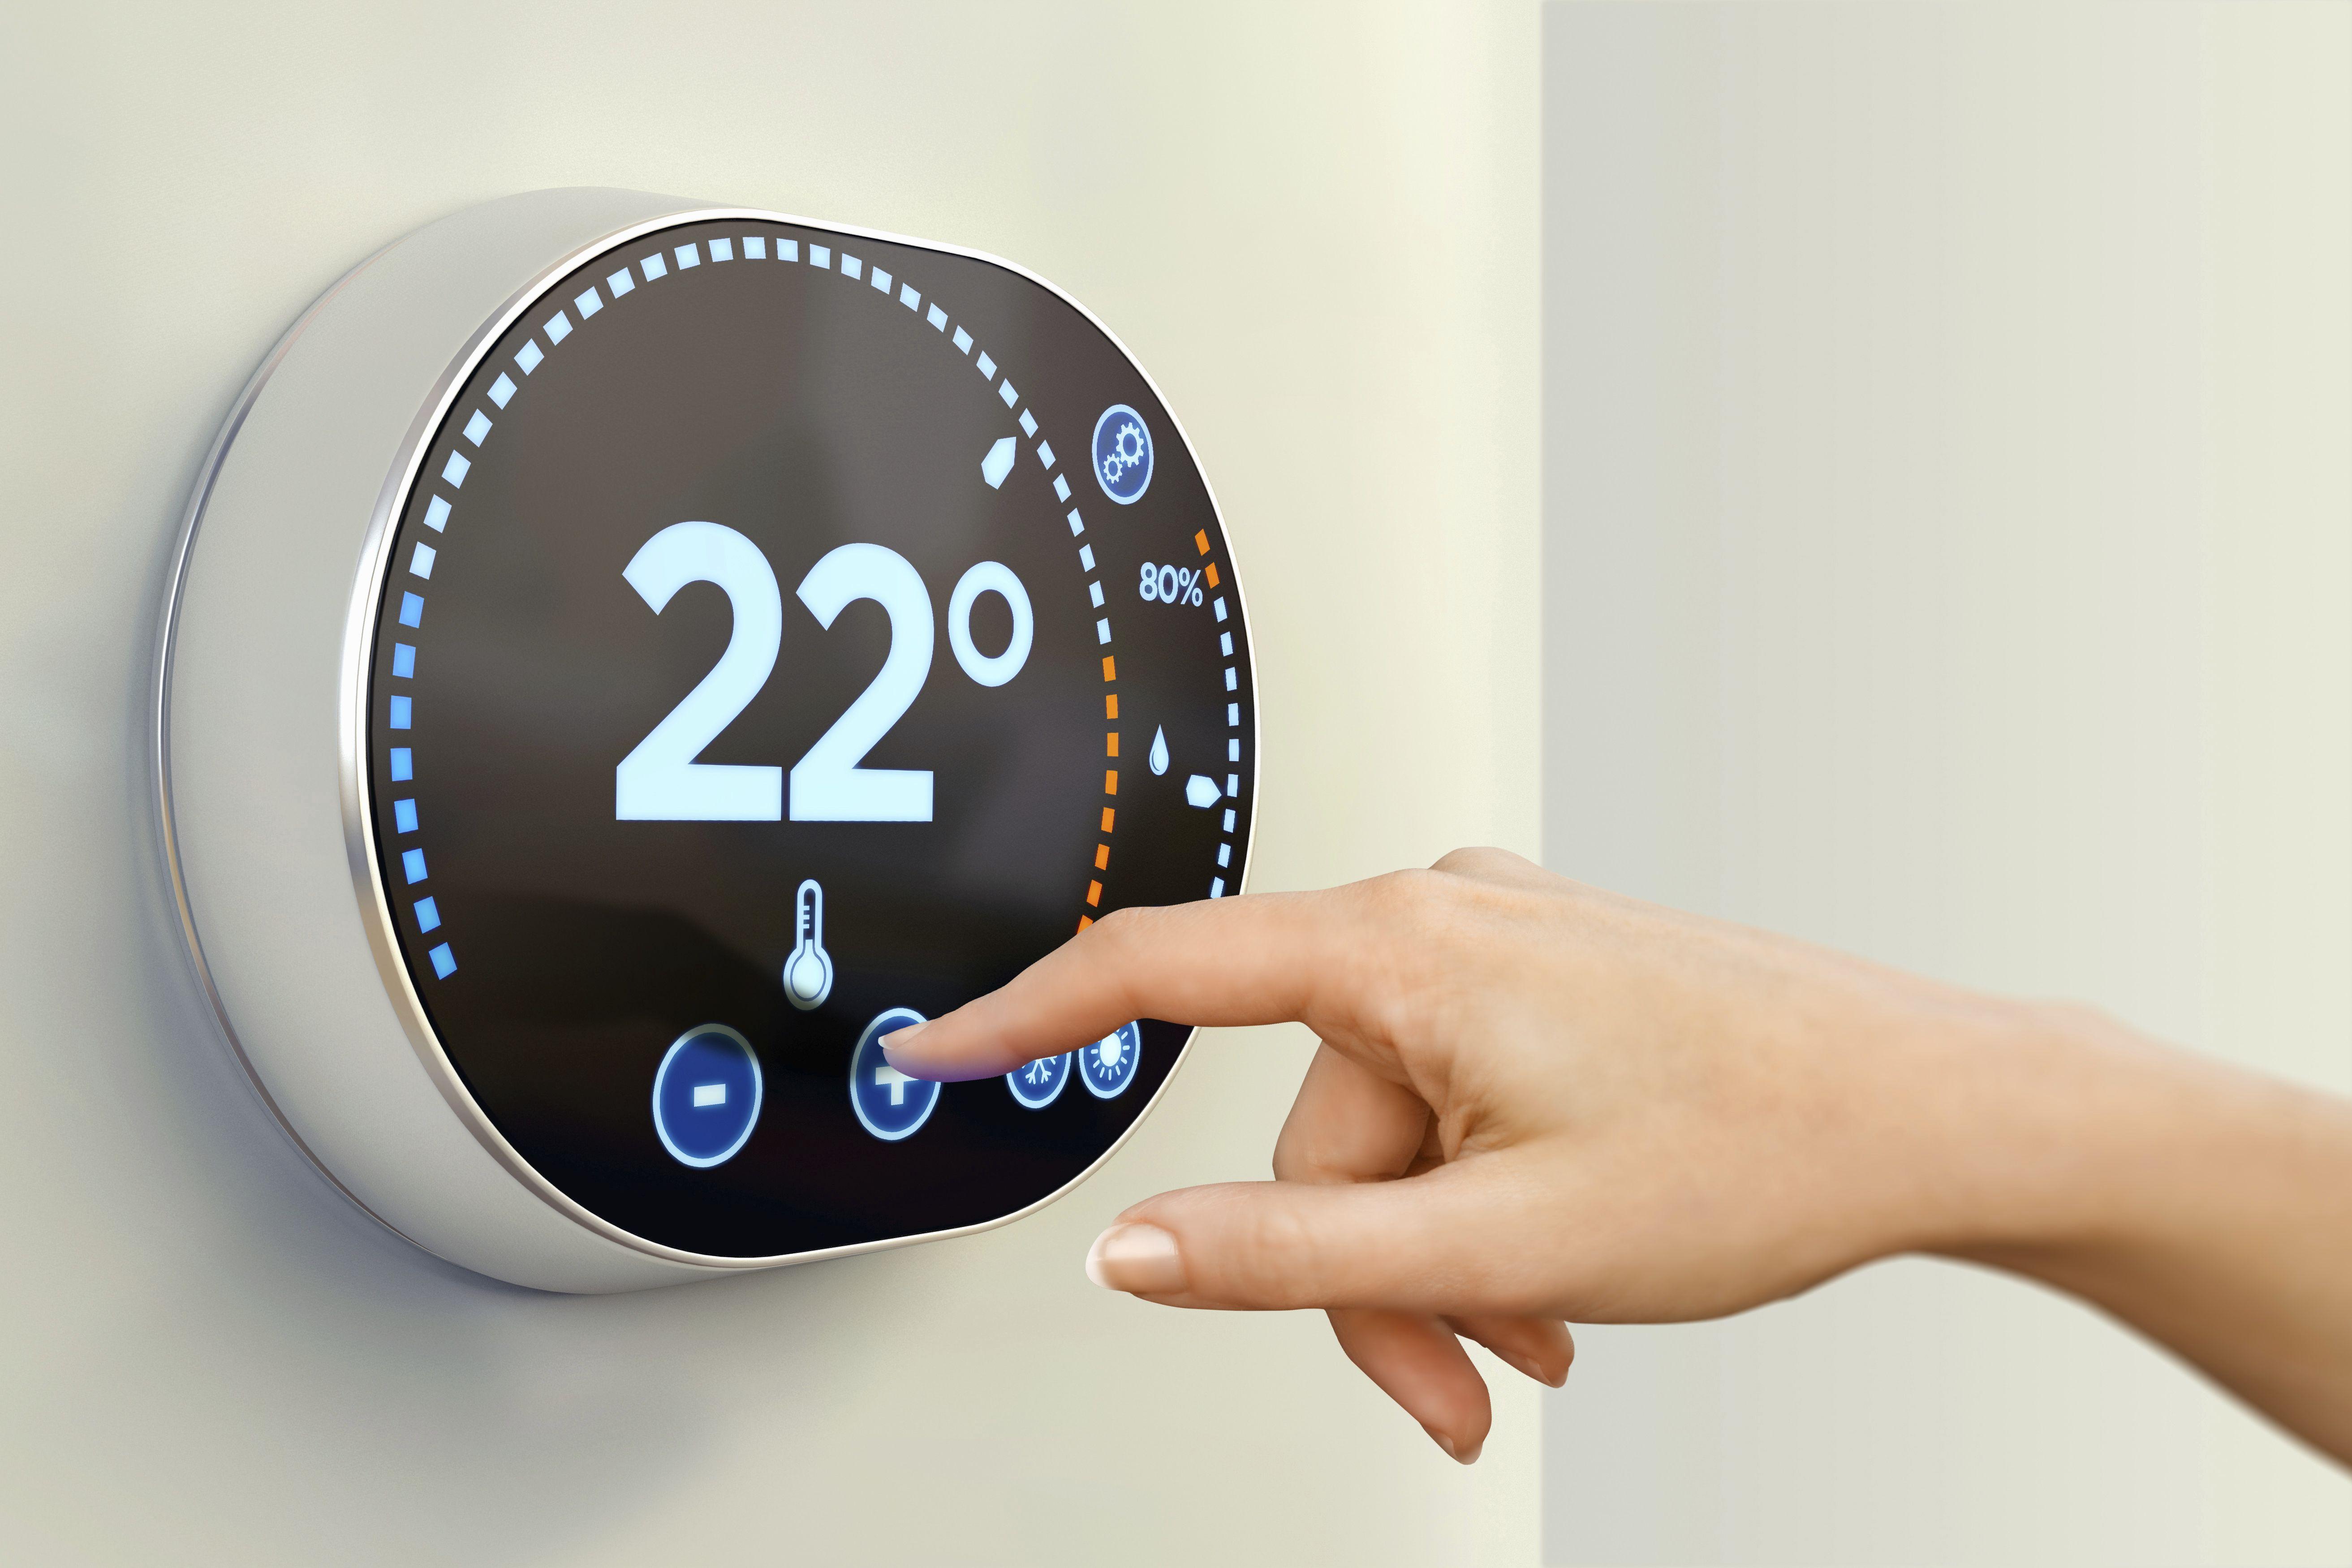 Sistemas de climatización en Madrid